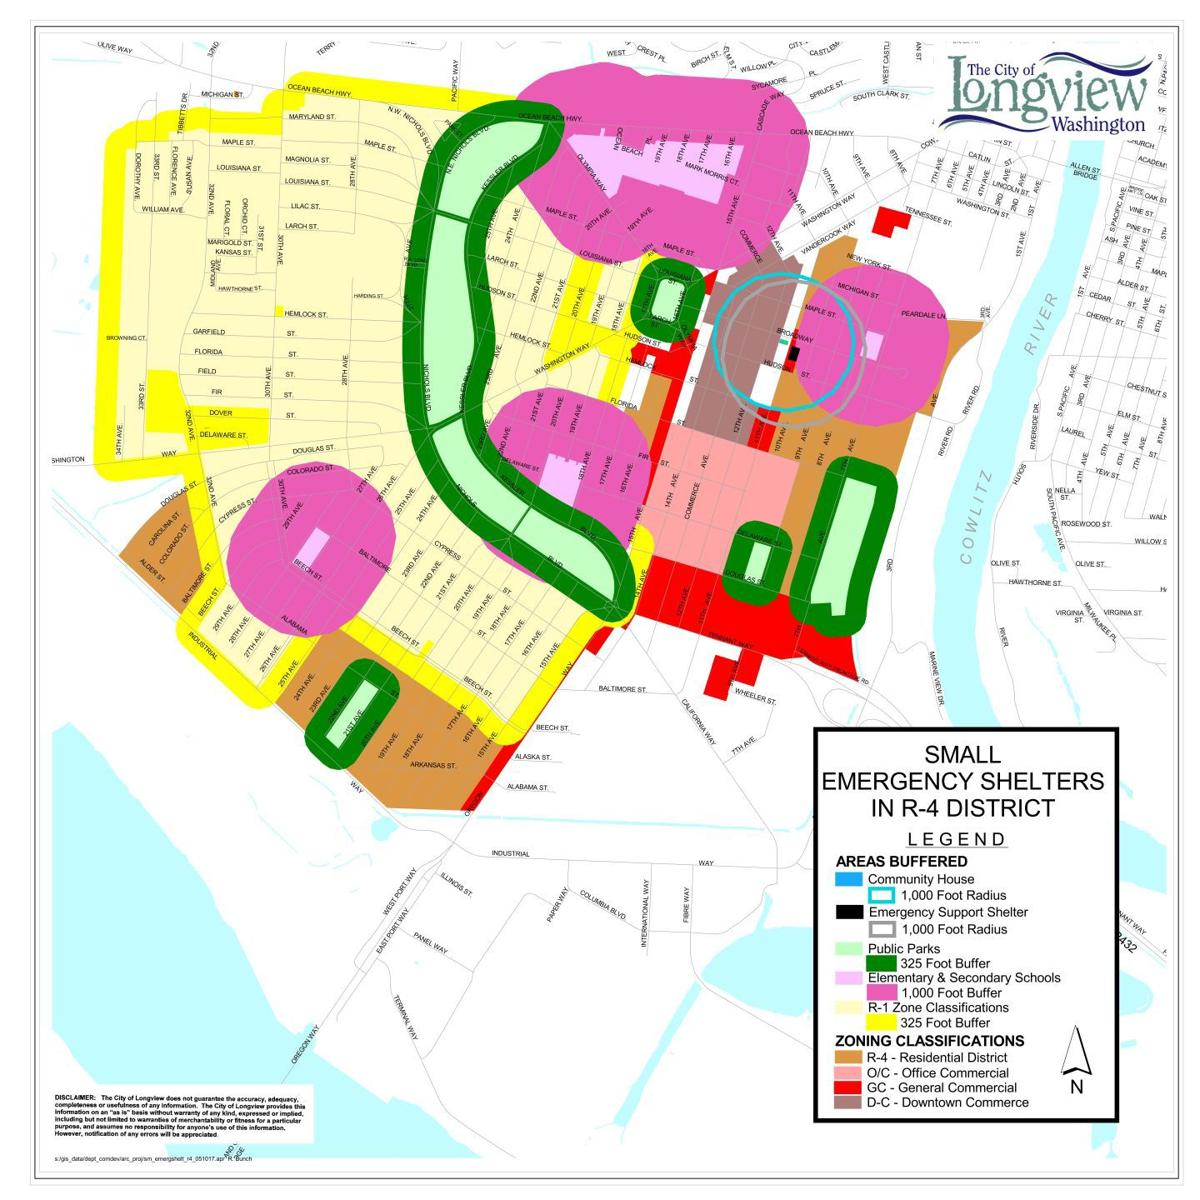 longview lake shelter map Longview S Shelter Zoning Proposal Gets Mixed Reviews Local longview lake shelter map